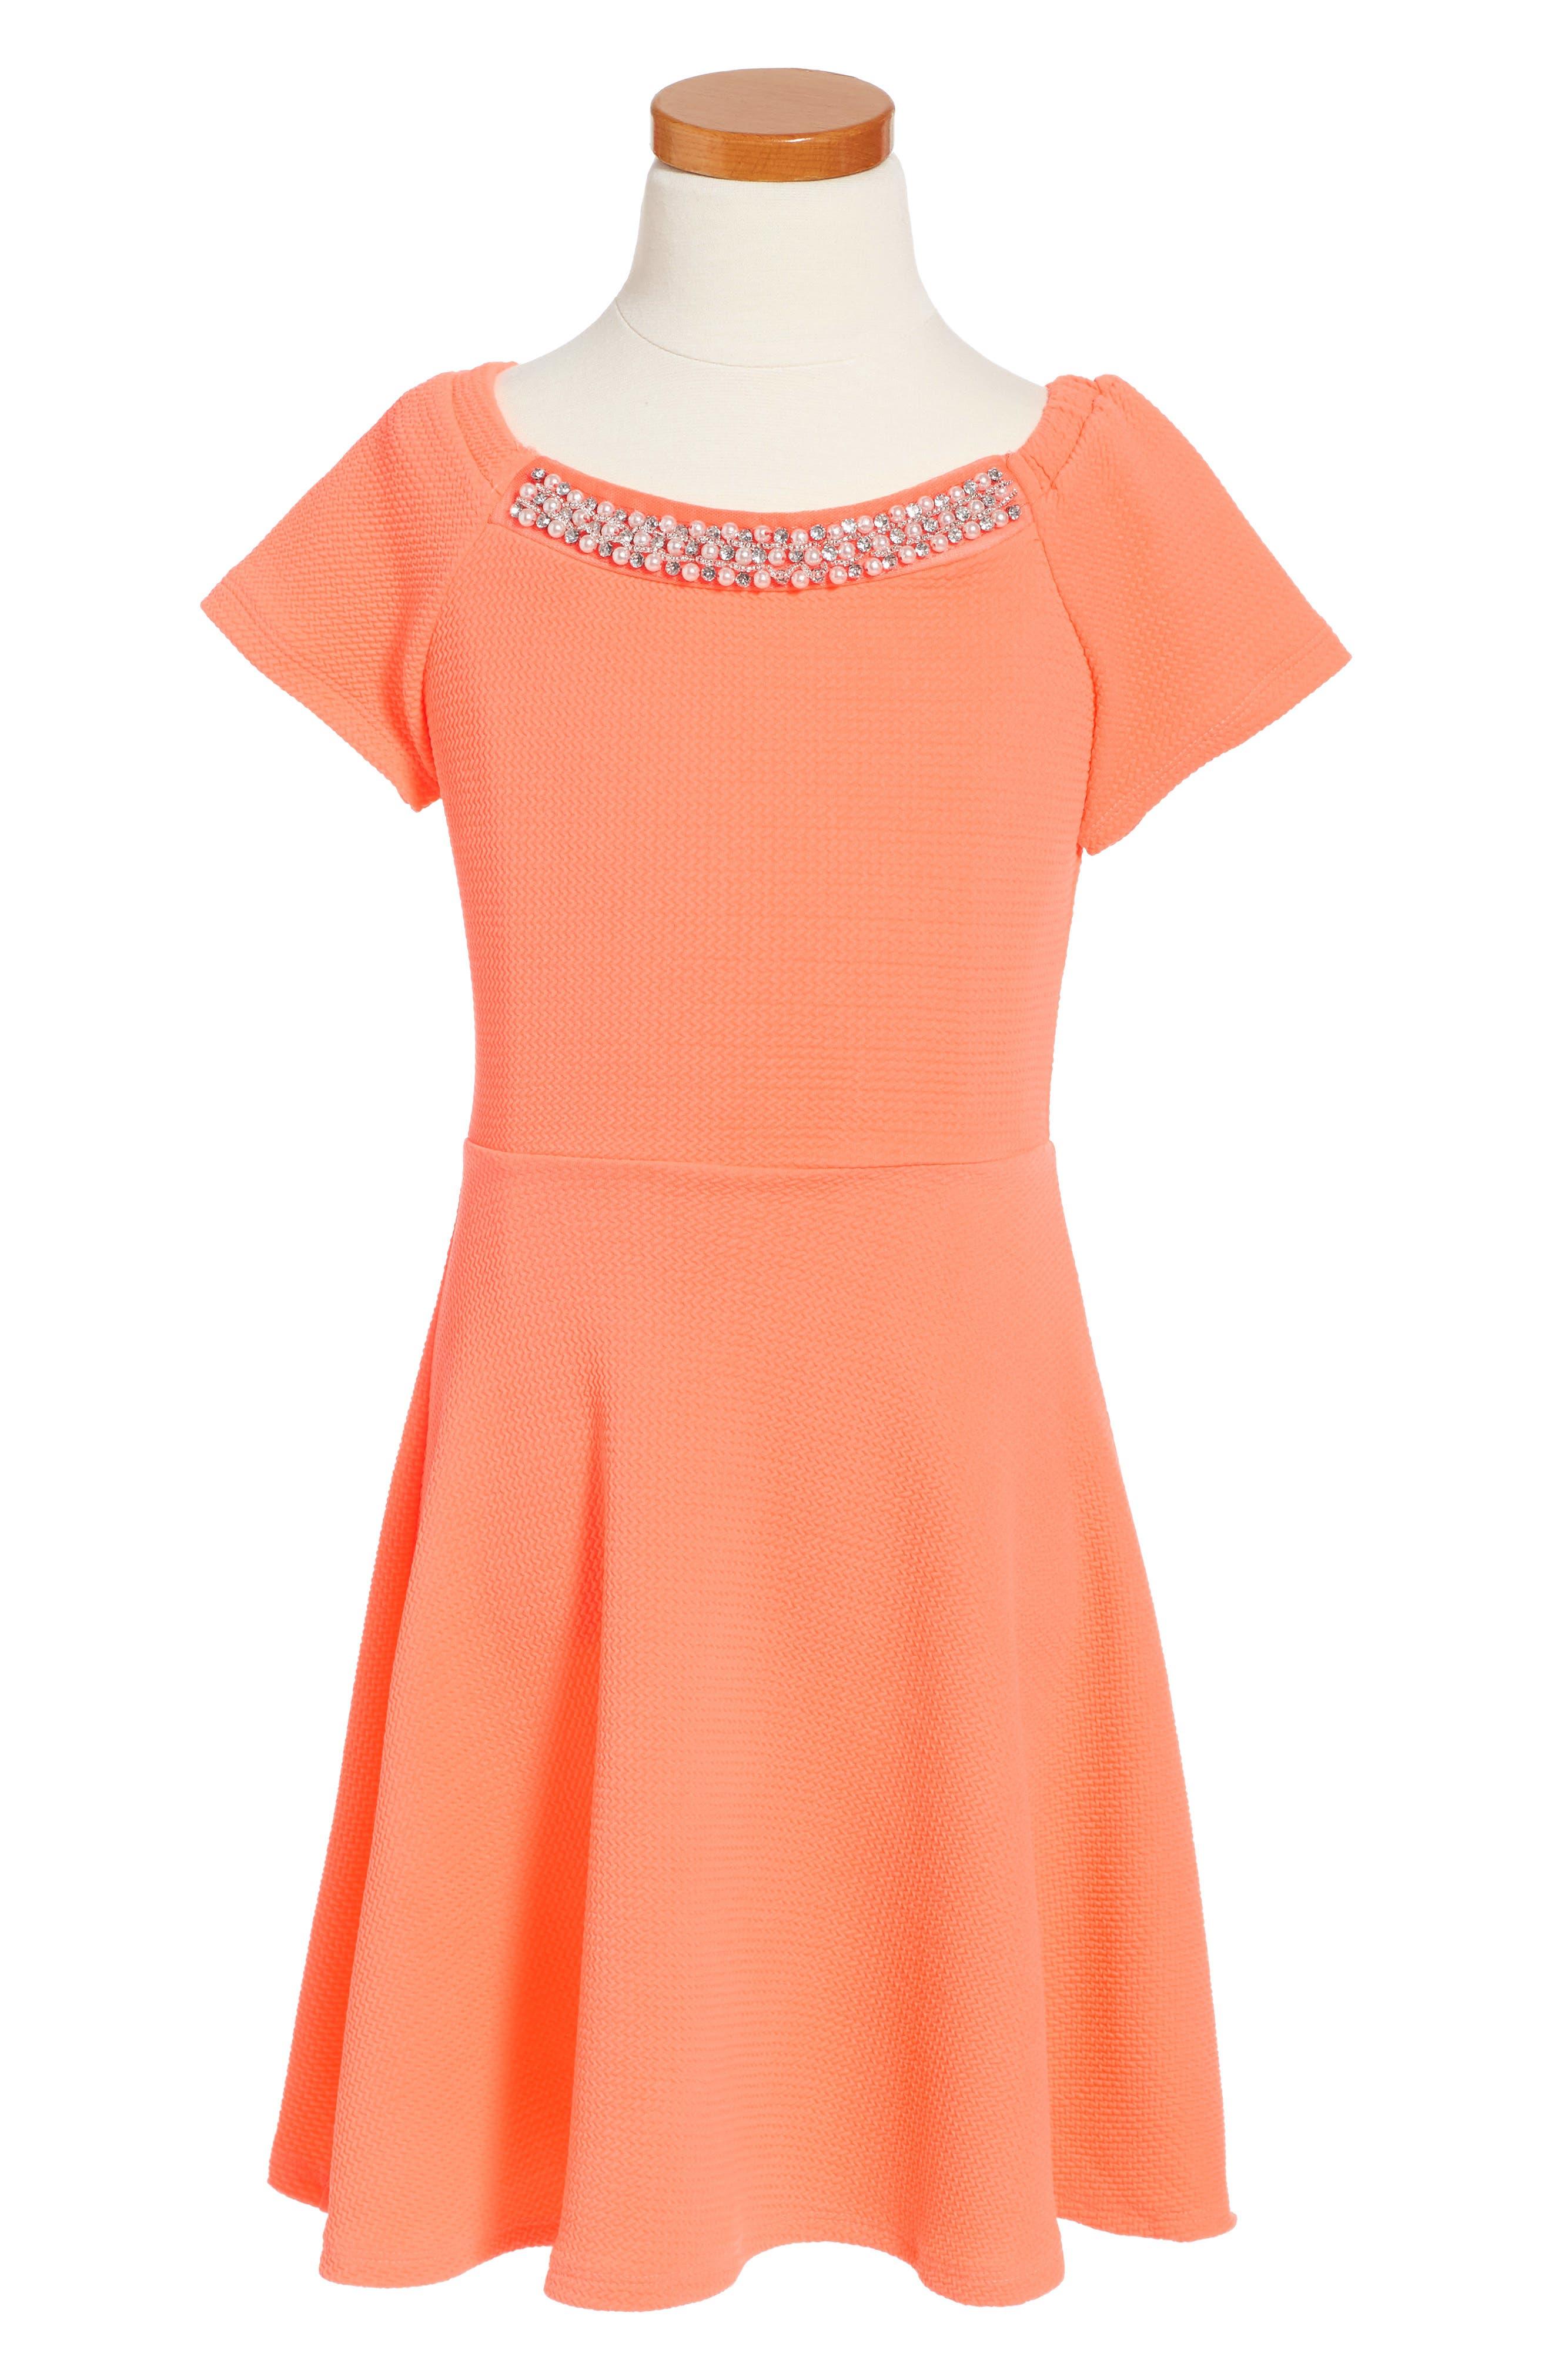 Monteau Couture Skater Dress (Big Girls)